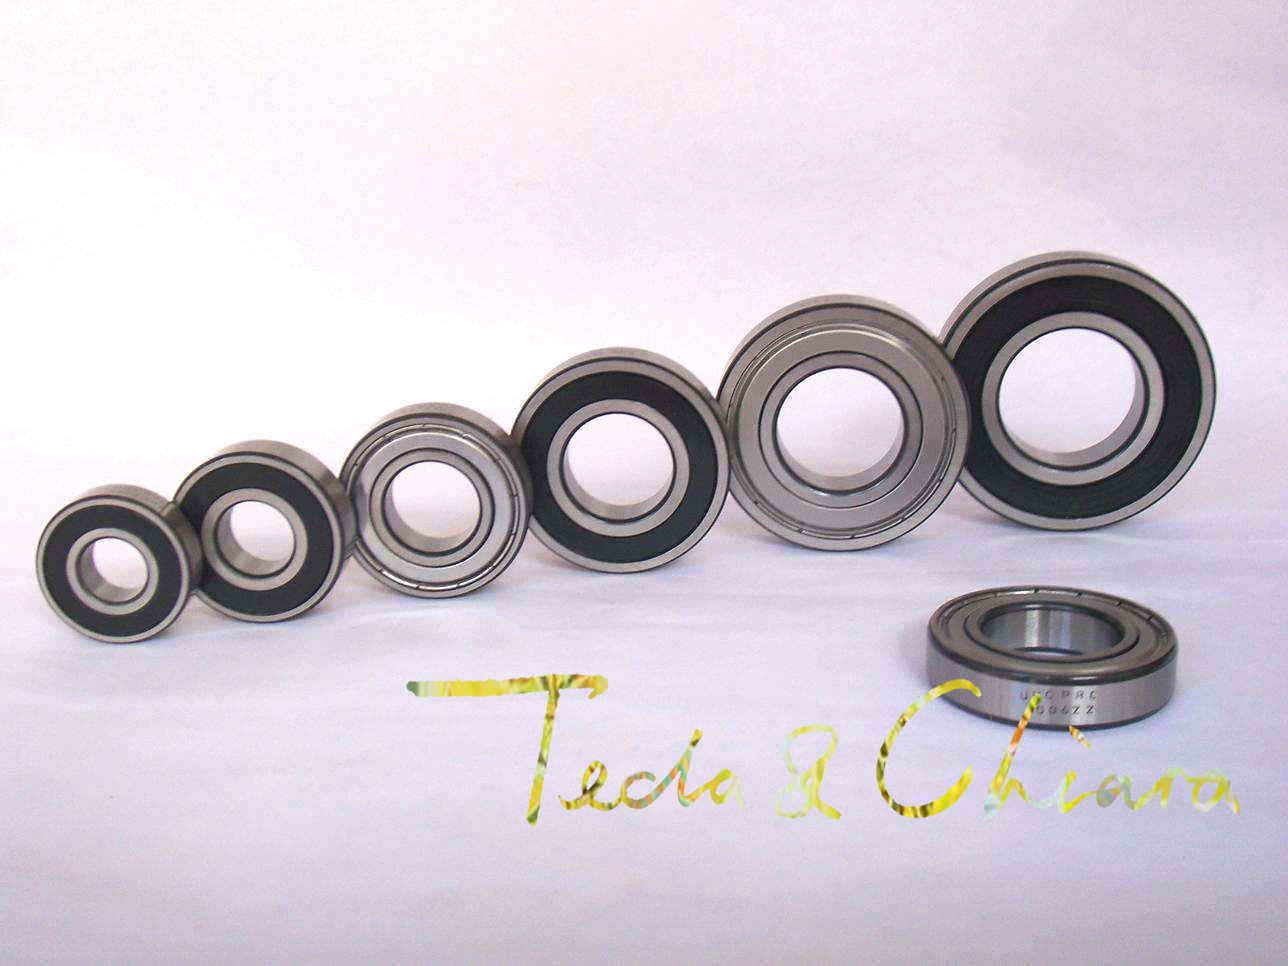 609 609ZZ 609RS 609-2Z 609Z 609-2RS ZZ RS RZ 2RZ Deep Groove Ball Bearings 9 x 24 x 7mm High Quality mr74 674zz 674rs mr74zz mr74rs mr74 2z mr74z mr74 2rs 674 674z zz rs rz 2rz deep groove ball bearings 4 x 7 x 2 5mm high quality